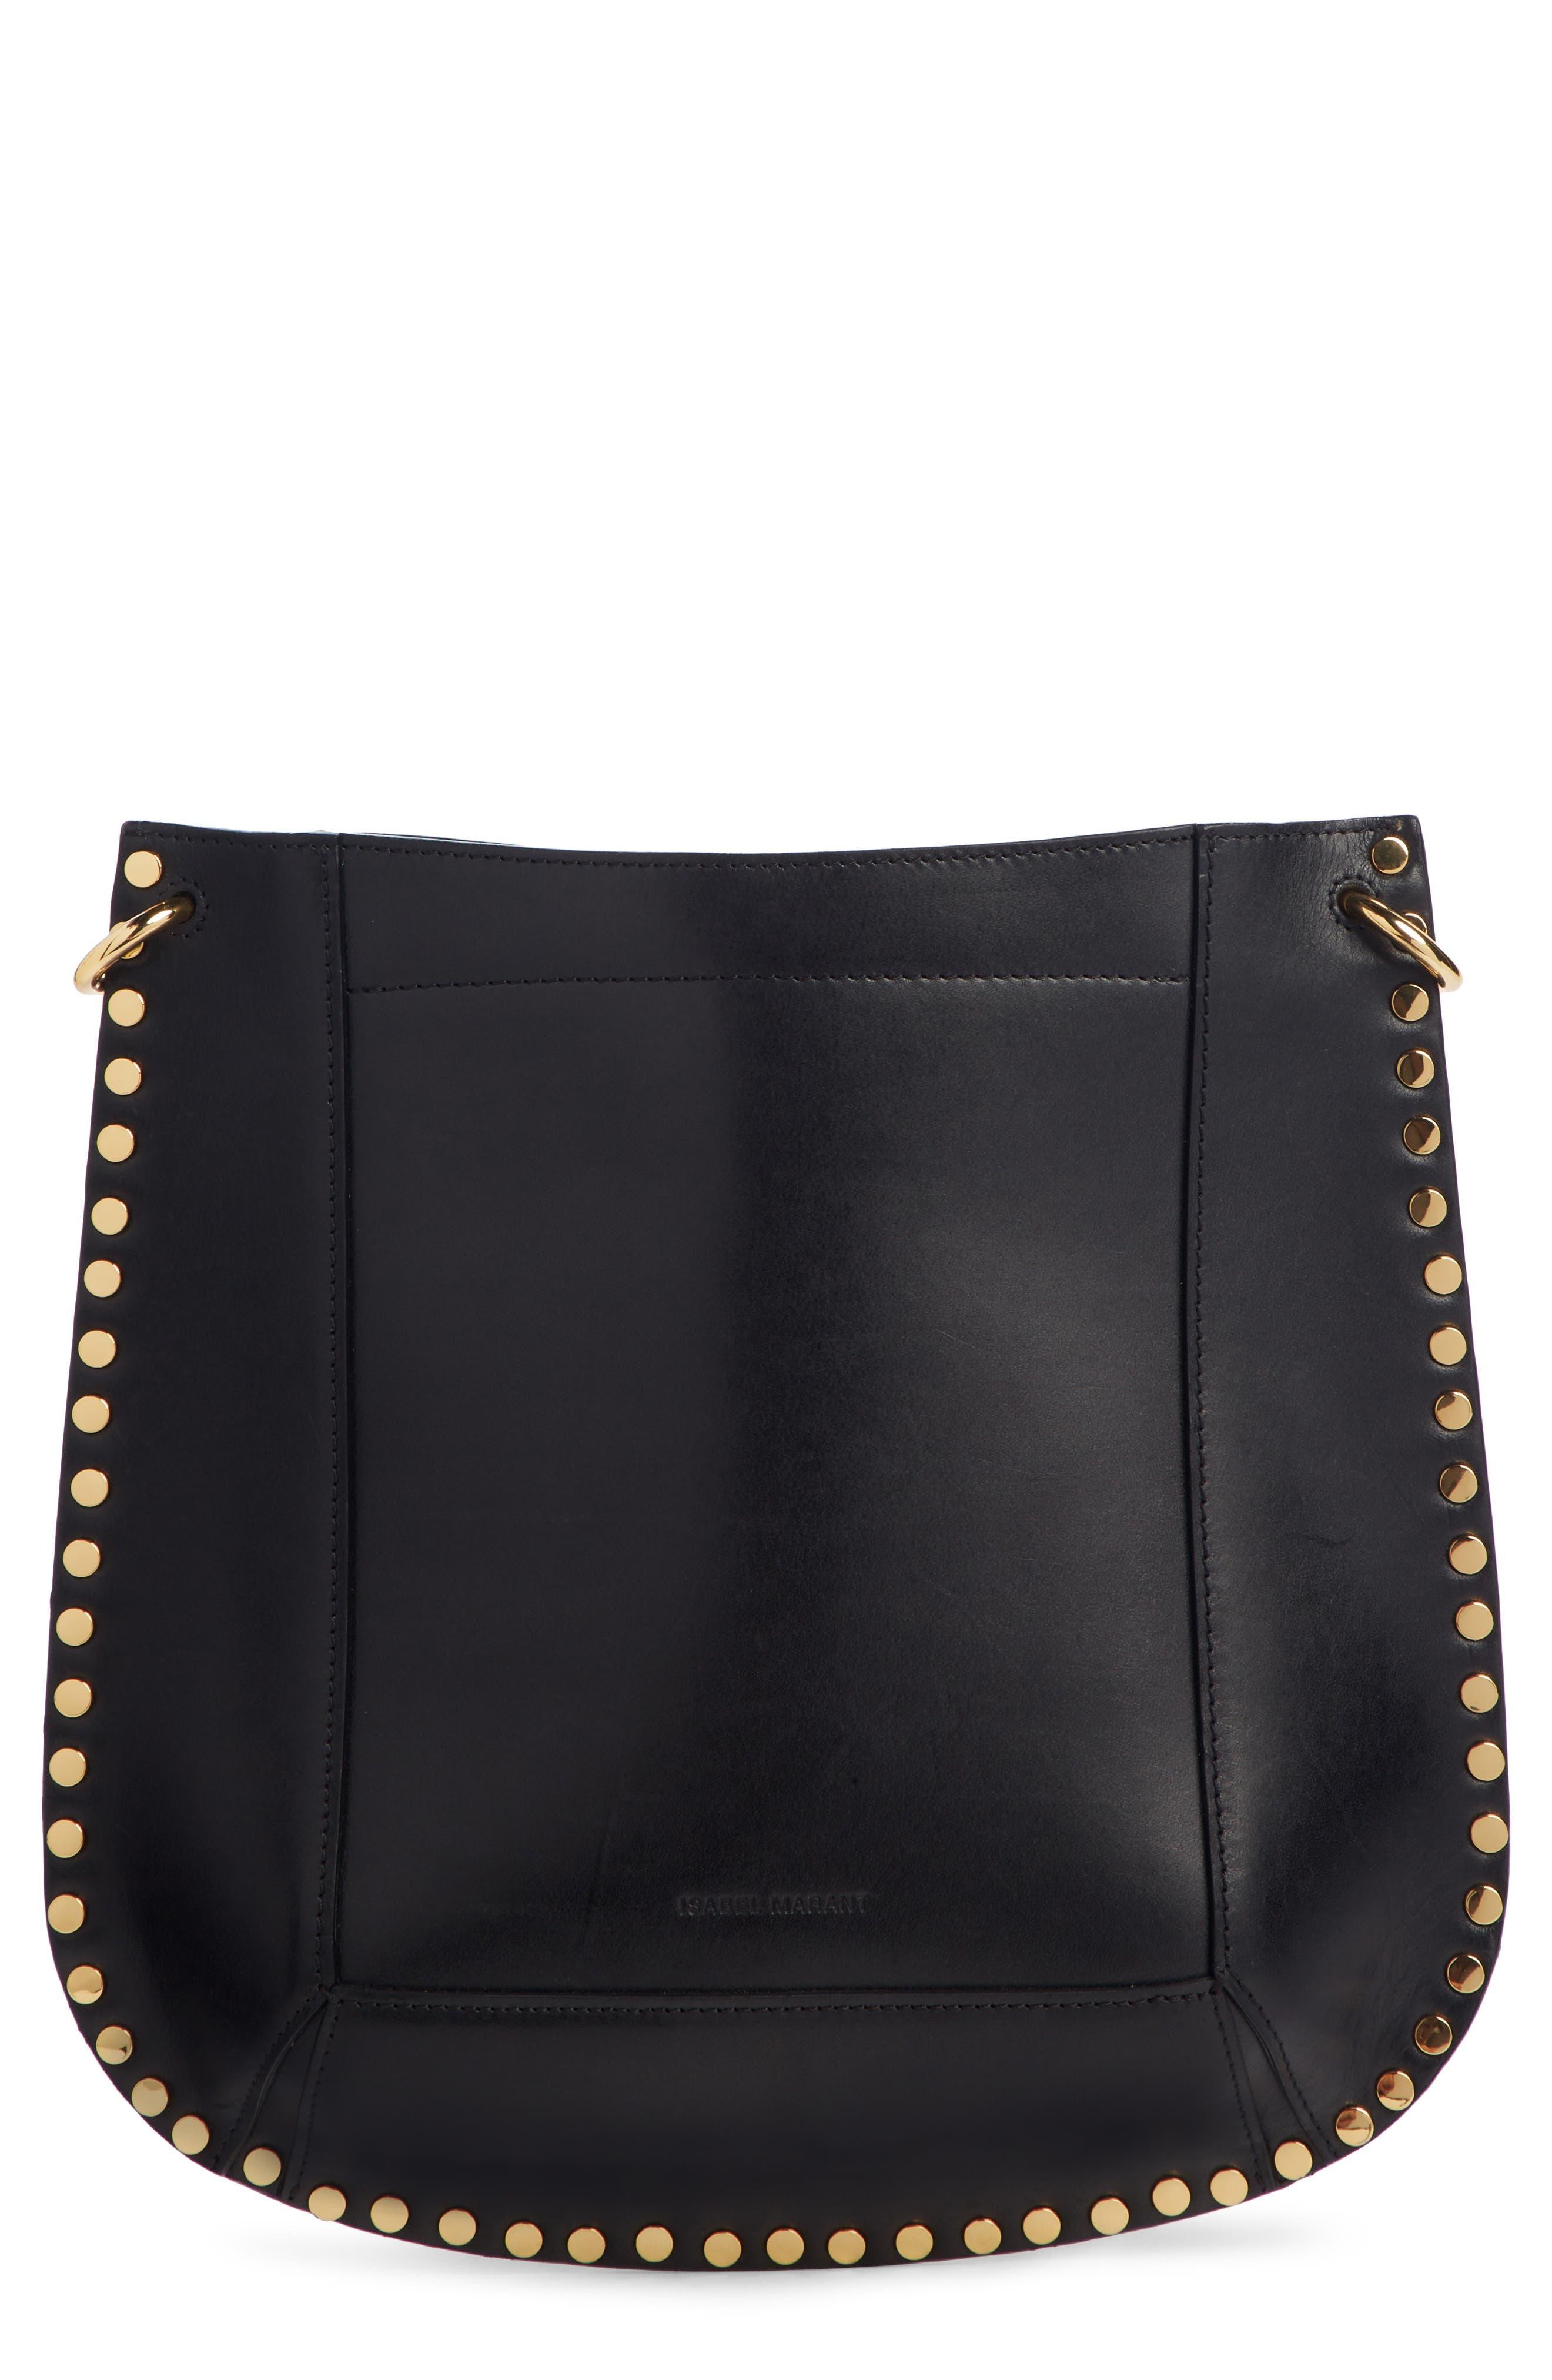 ISABEL MARANT,                             Oskan New Leather Hobo,                             Main thumbnail 1, color,                             BLACK